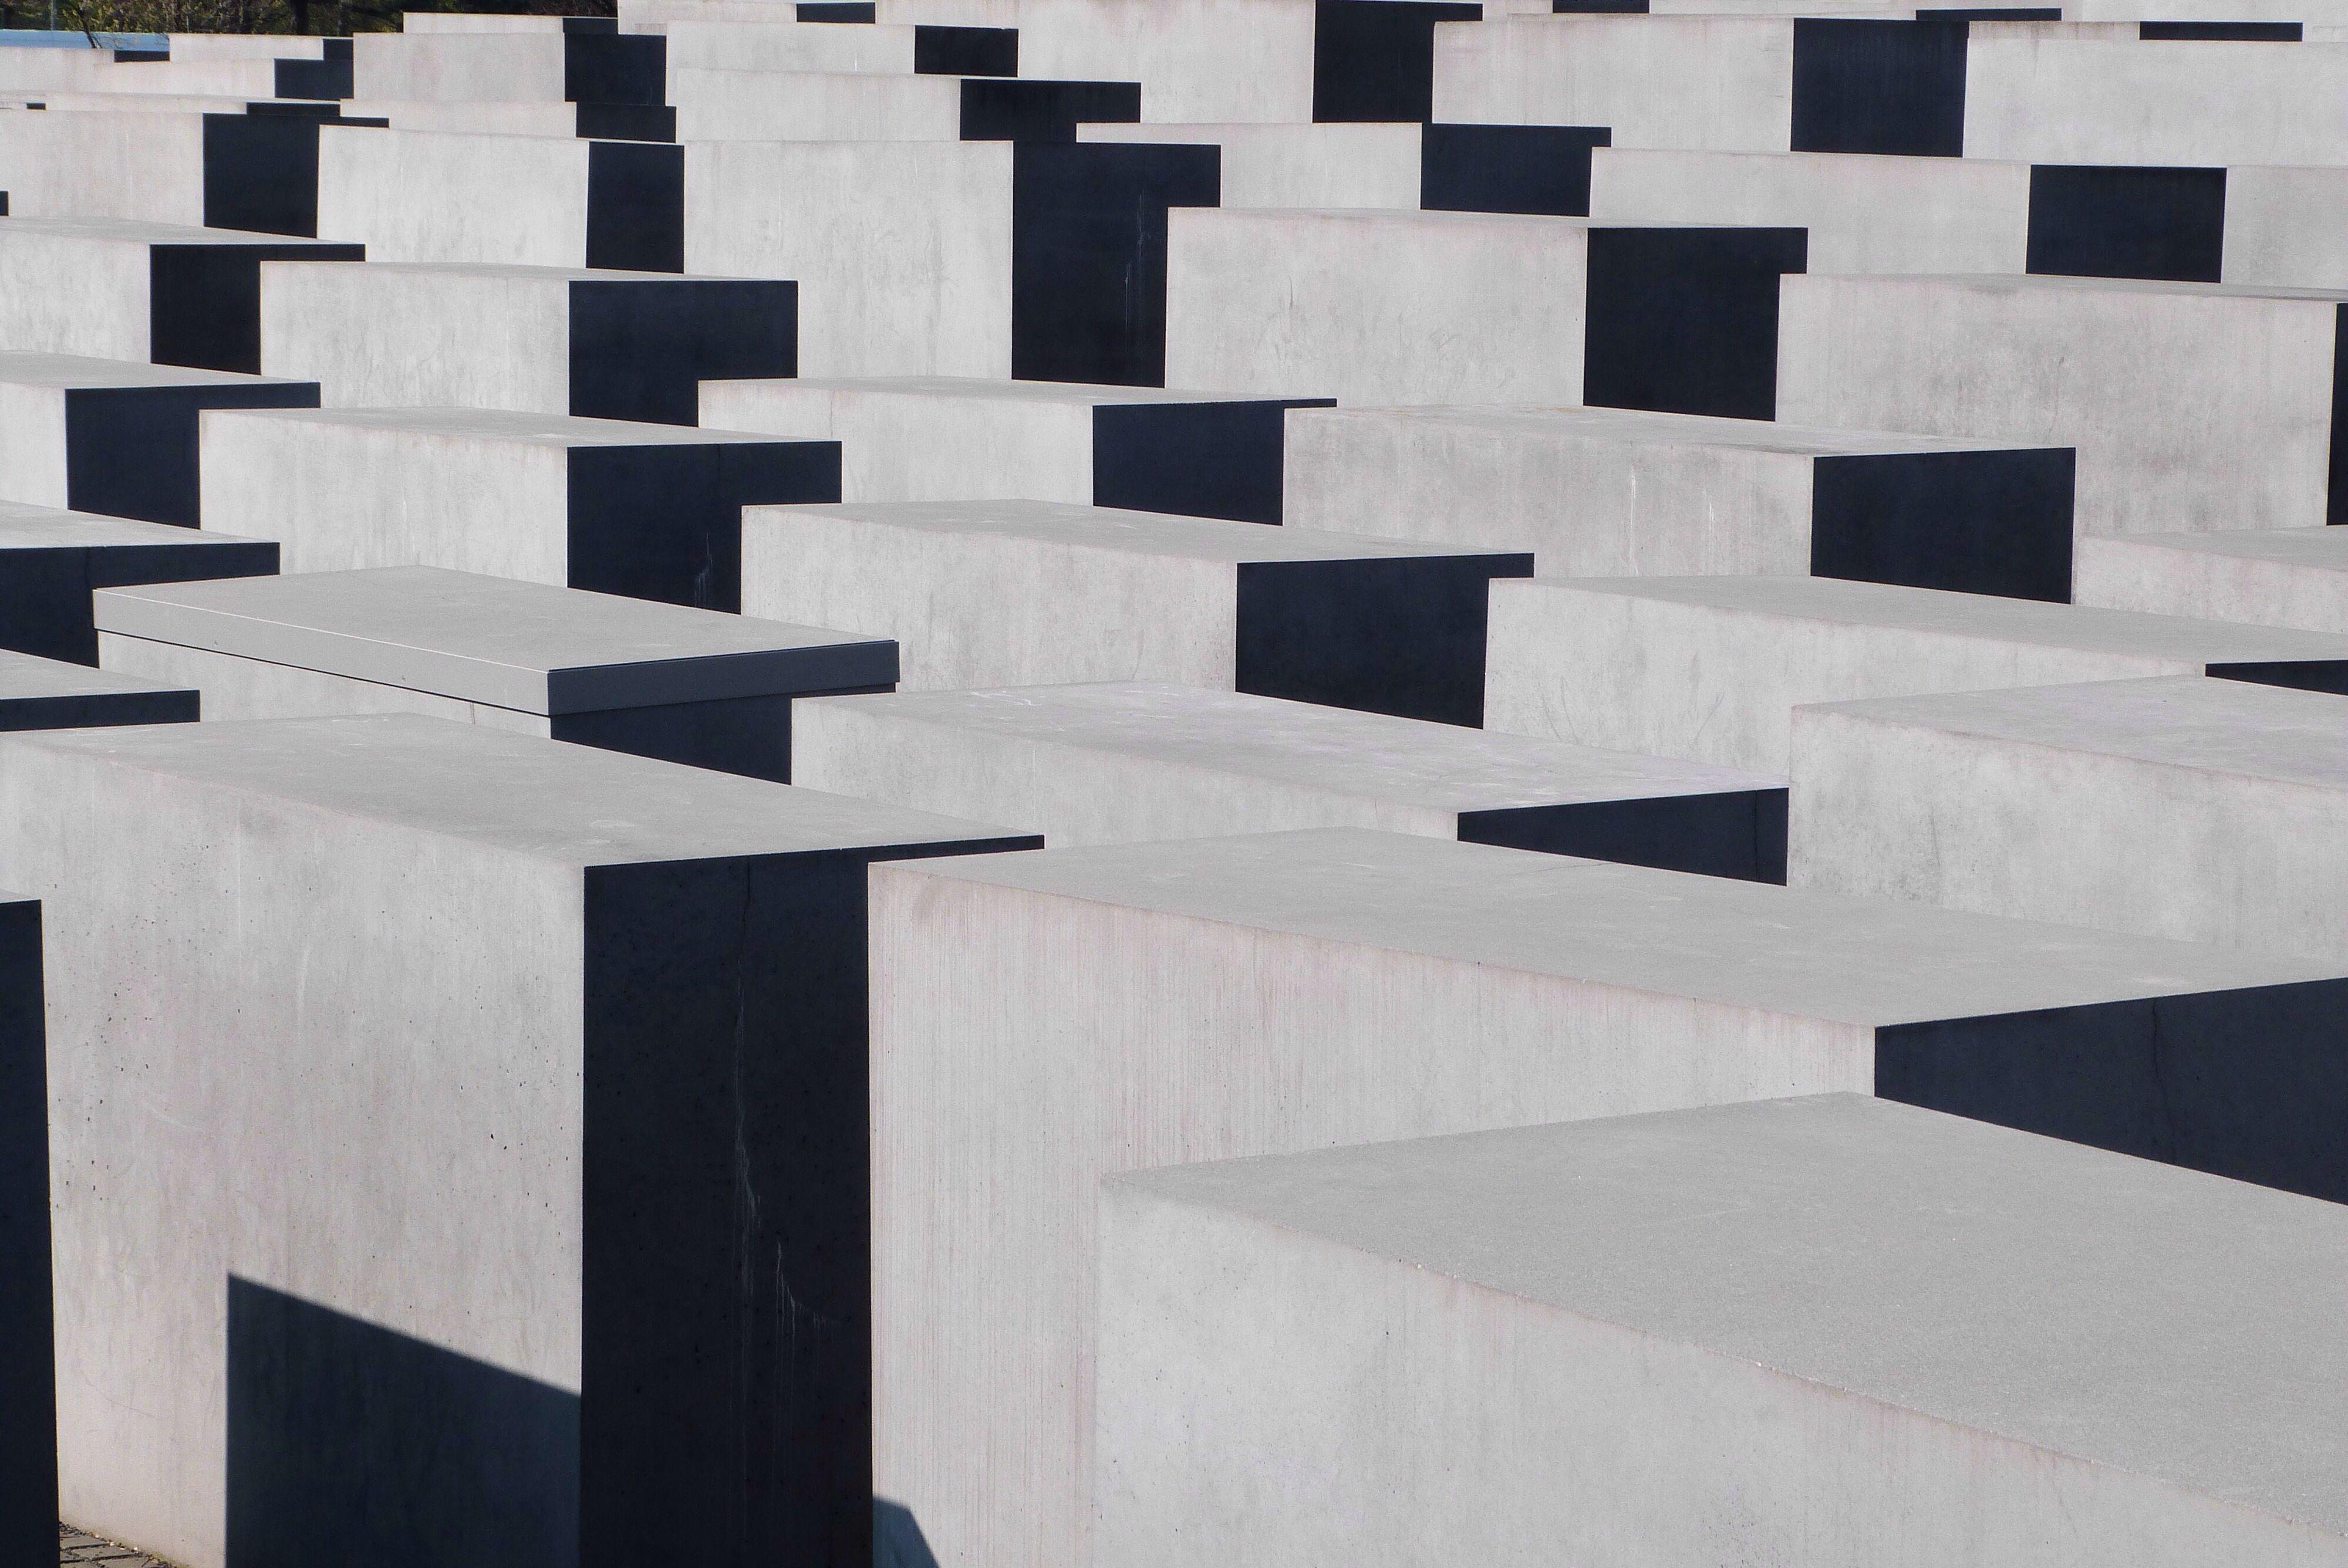 Potsdamer platz, holocaust monument